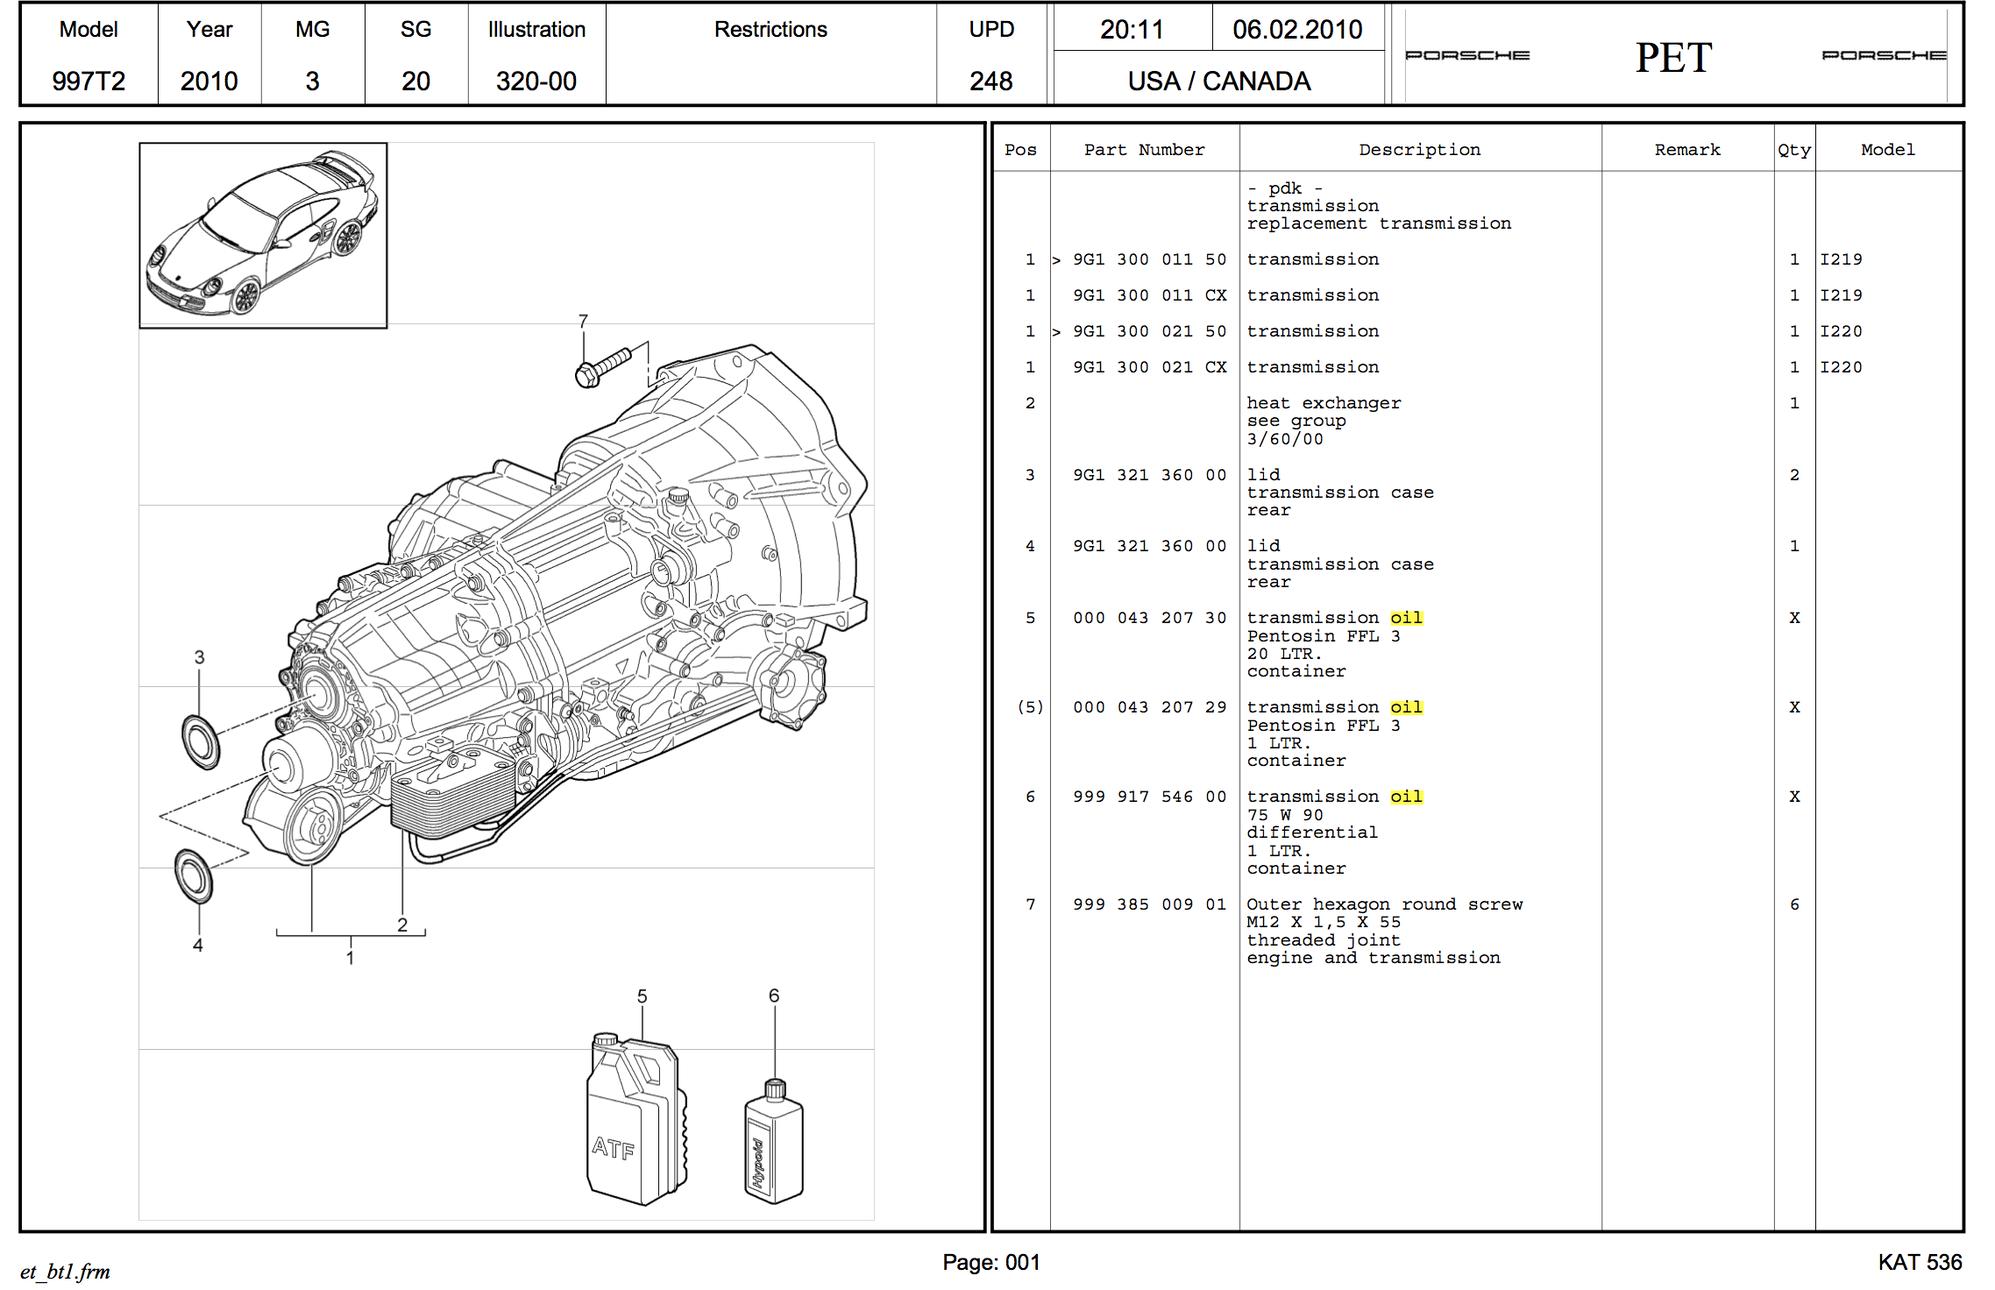 P0846 also 1978 Porsche 928 Wiring Diagrams in addition 142 587 22237 furthermore 1986 Porsche 944 Power Steering Diagram likewise Page2. on porsche transmission fluid